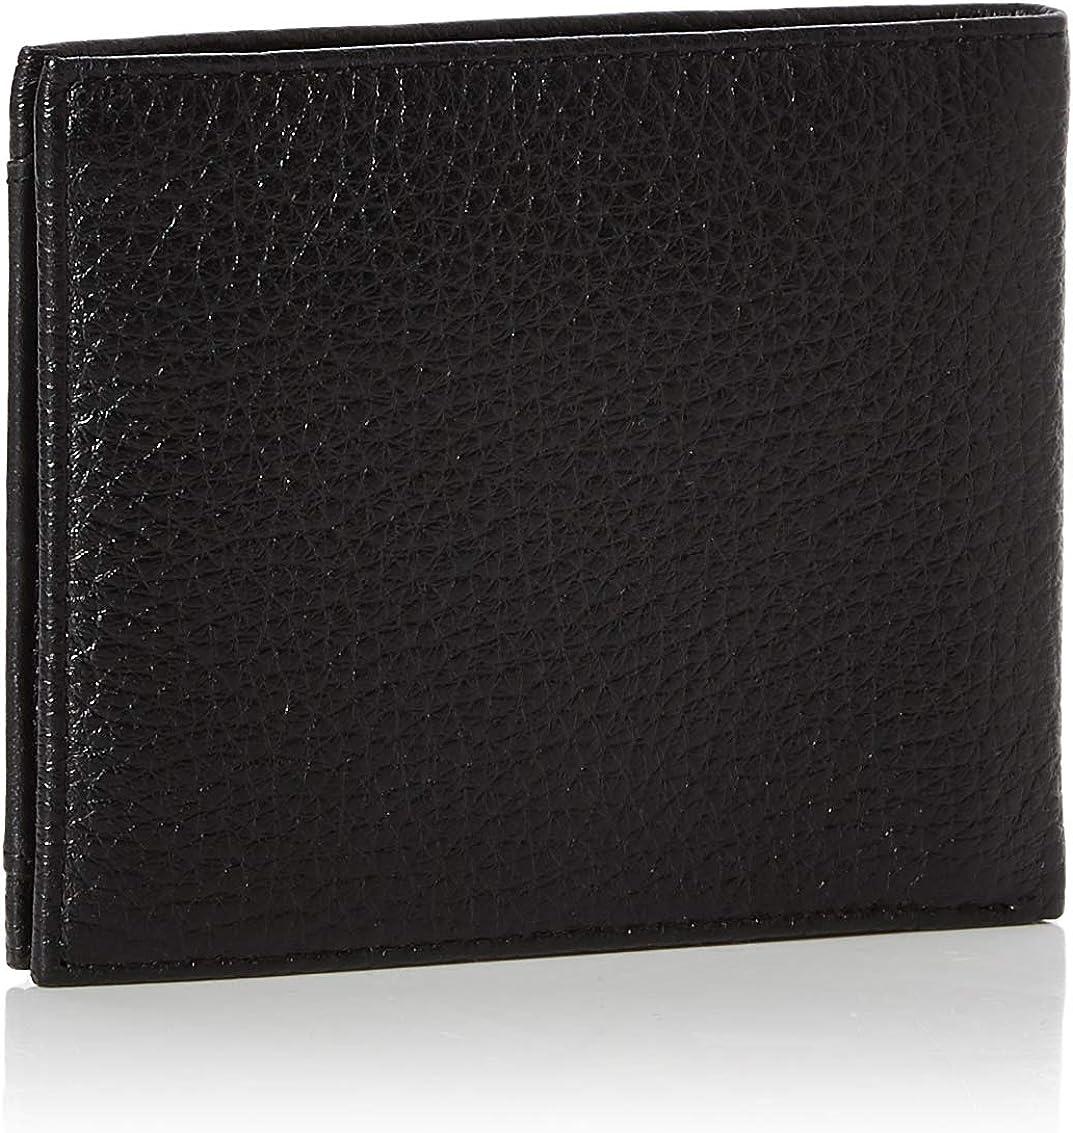 Black Sacs port/és /épaule homme Tommy Hilfiger Downtown Mini Cc Wallet/&key Fob W x H L Noir 1x1x1 cm